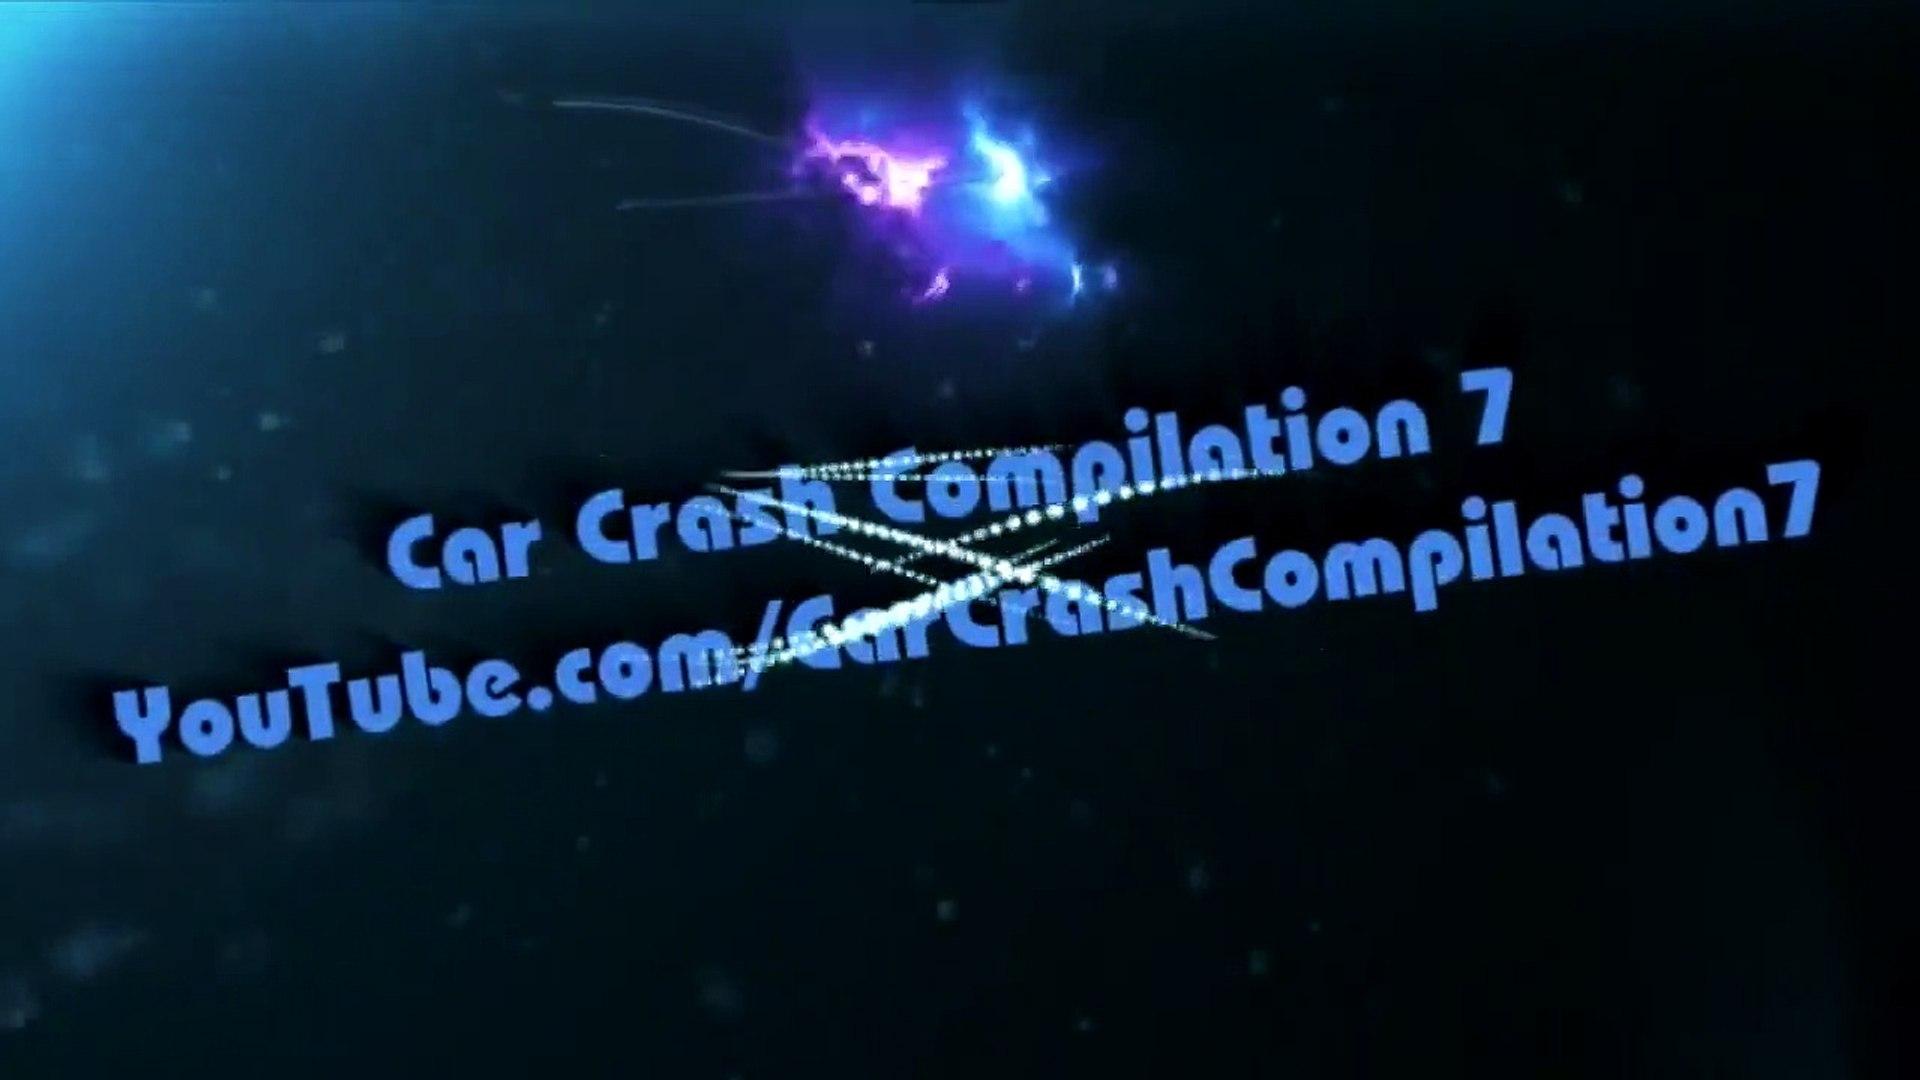 Car Crash Compilation 889 - Ap